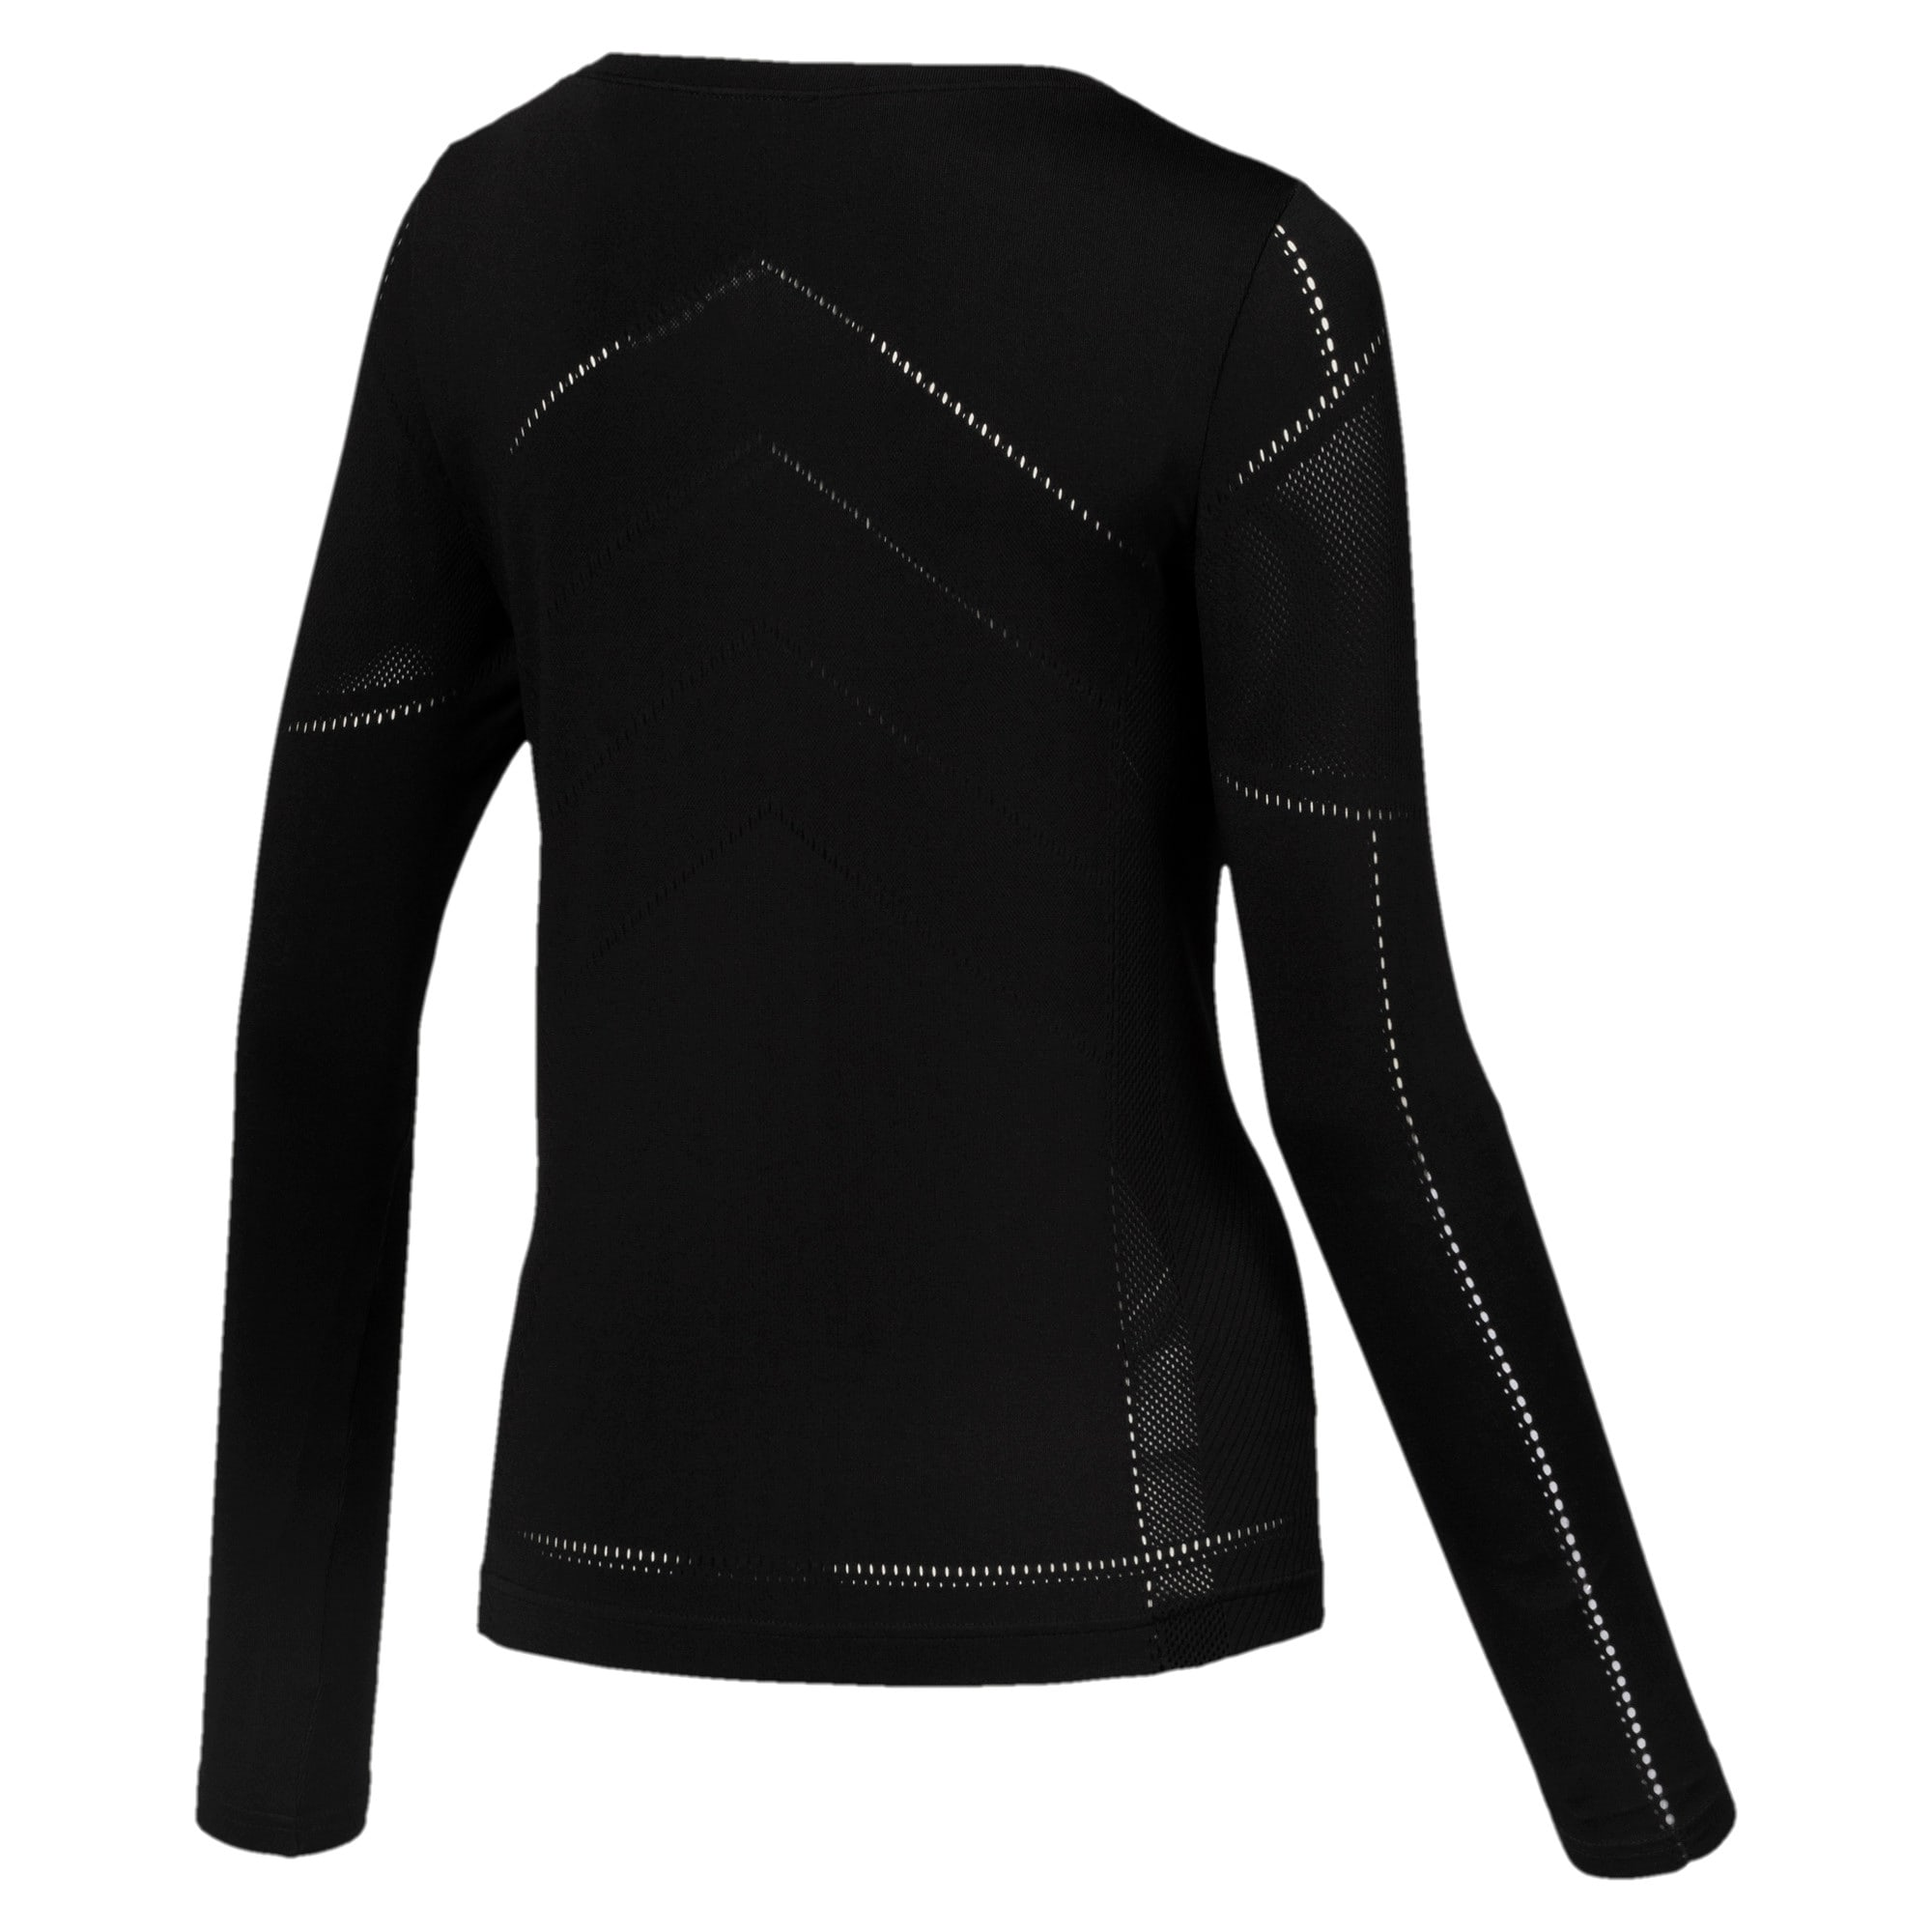 Thumbnail 3 of evoKNIT Seamless Long Sleeve Top, Puma Black, medium